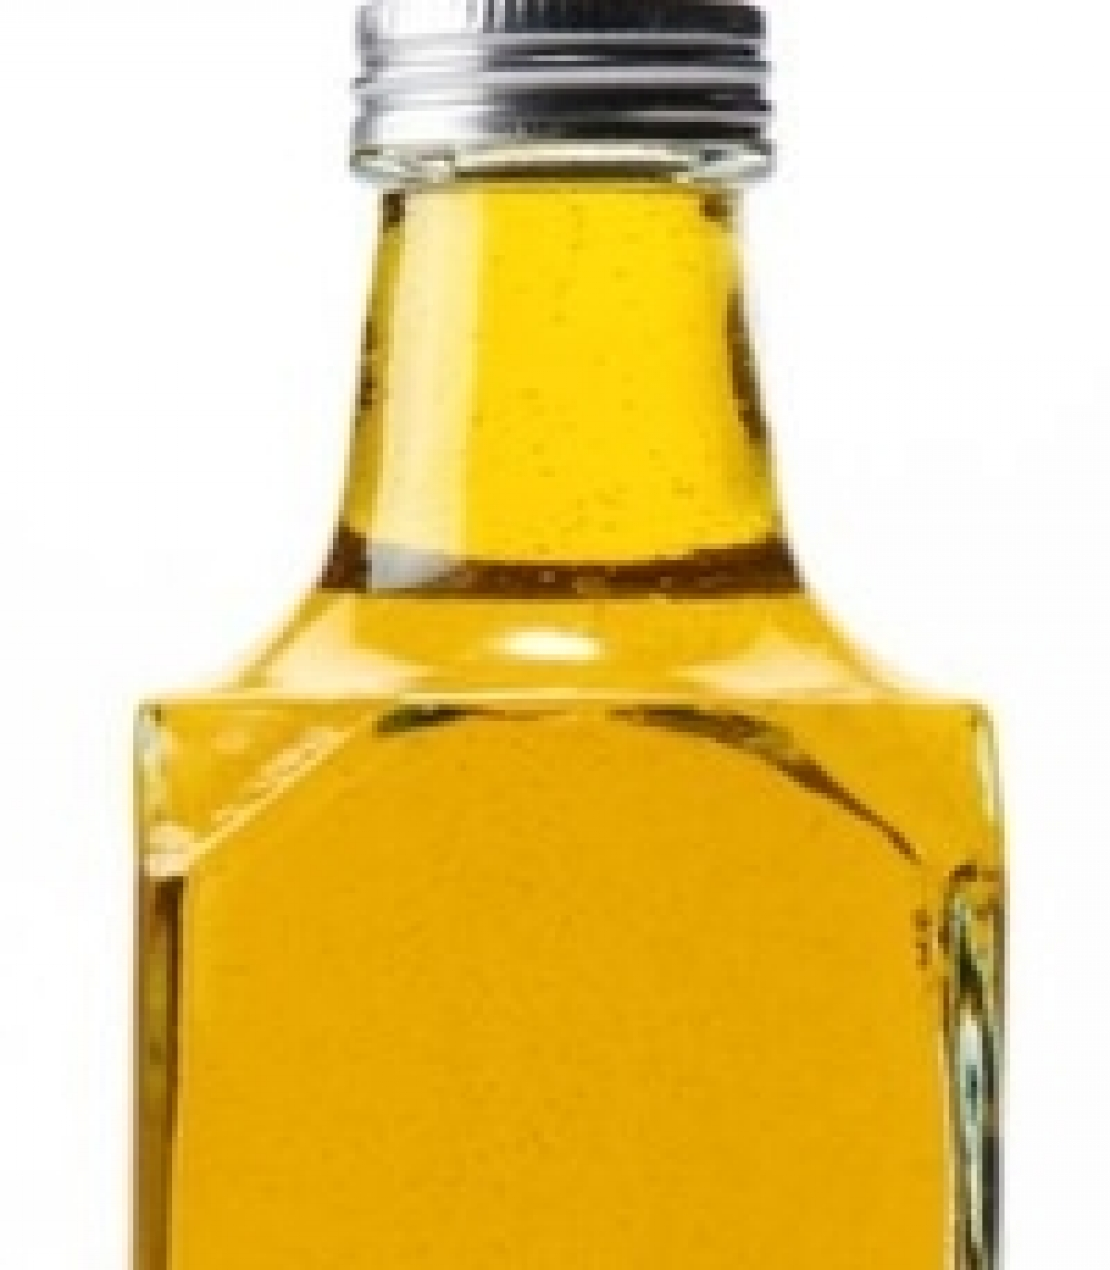 L'olio extra vergine d'oliva protegge il cuore